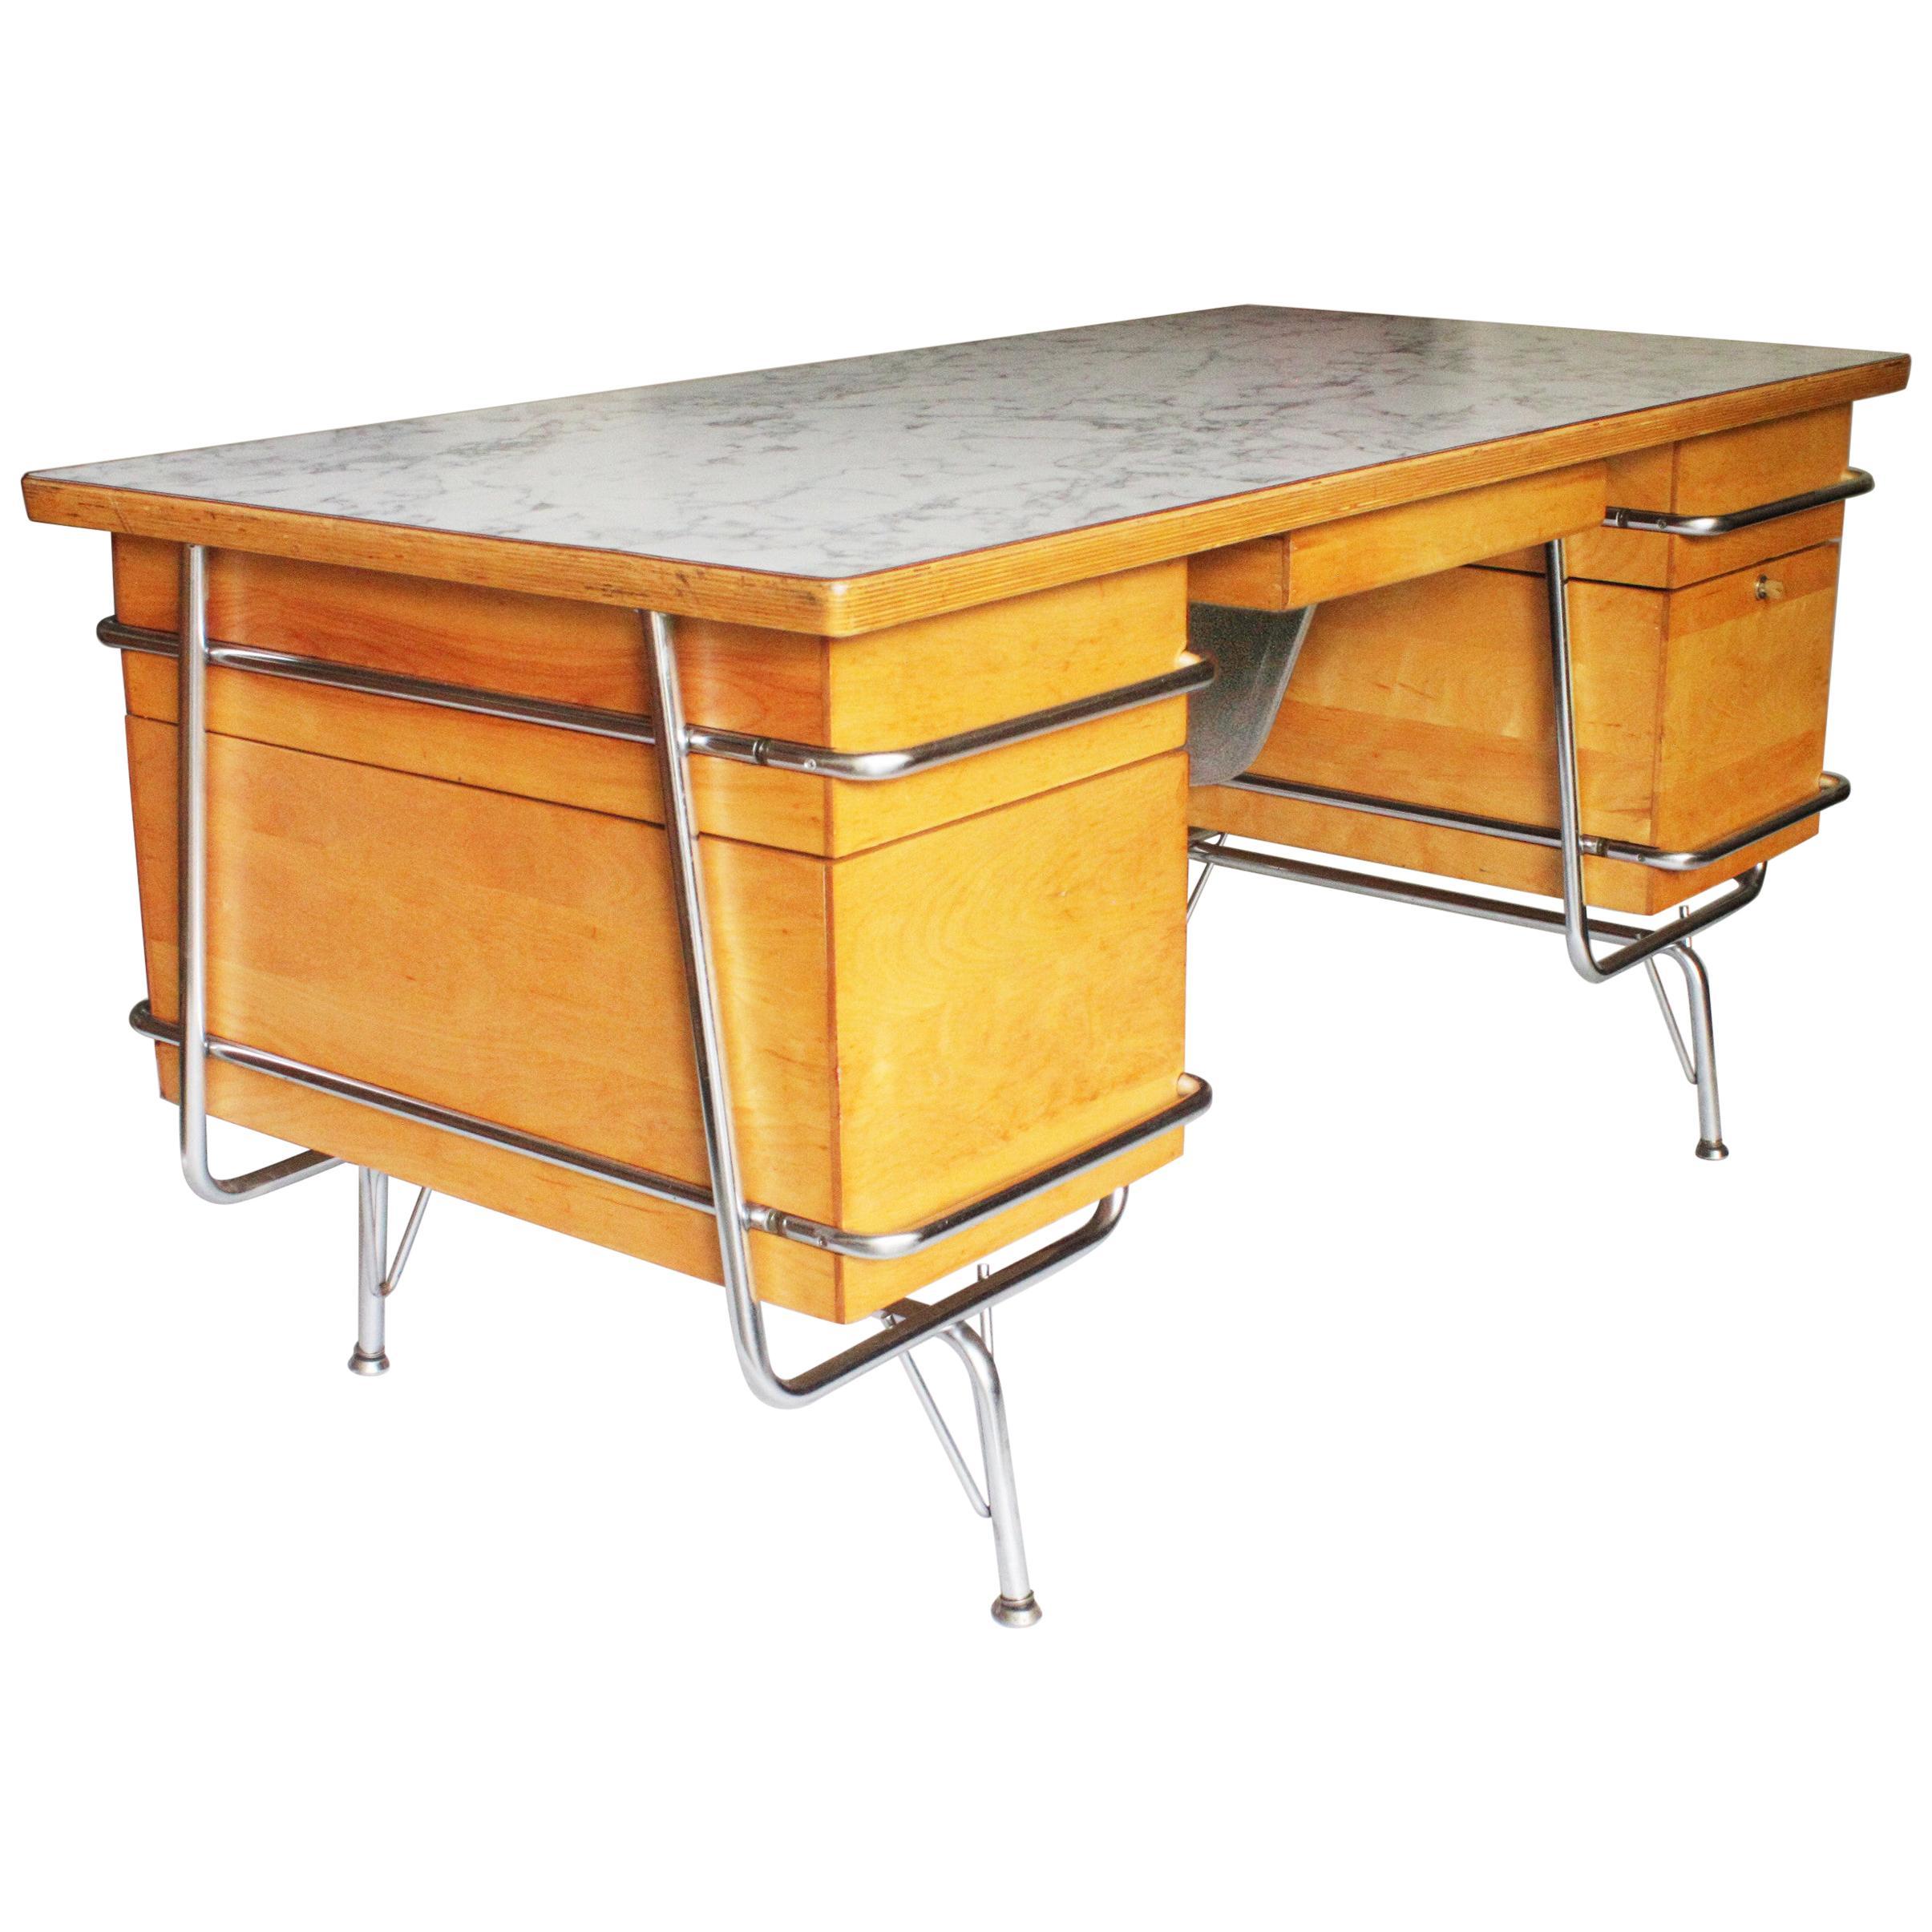 Vintage 1950s Mid Century Modern Industrial Trimline Executive Desk By KEM  Weber